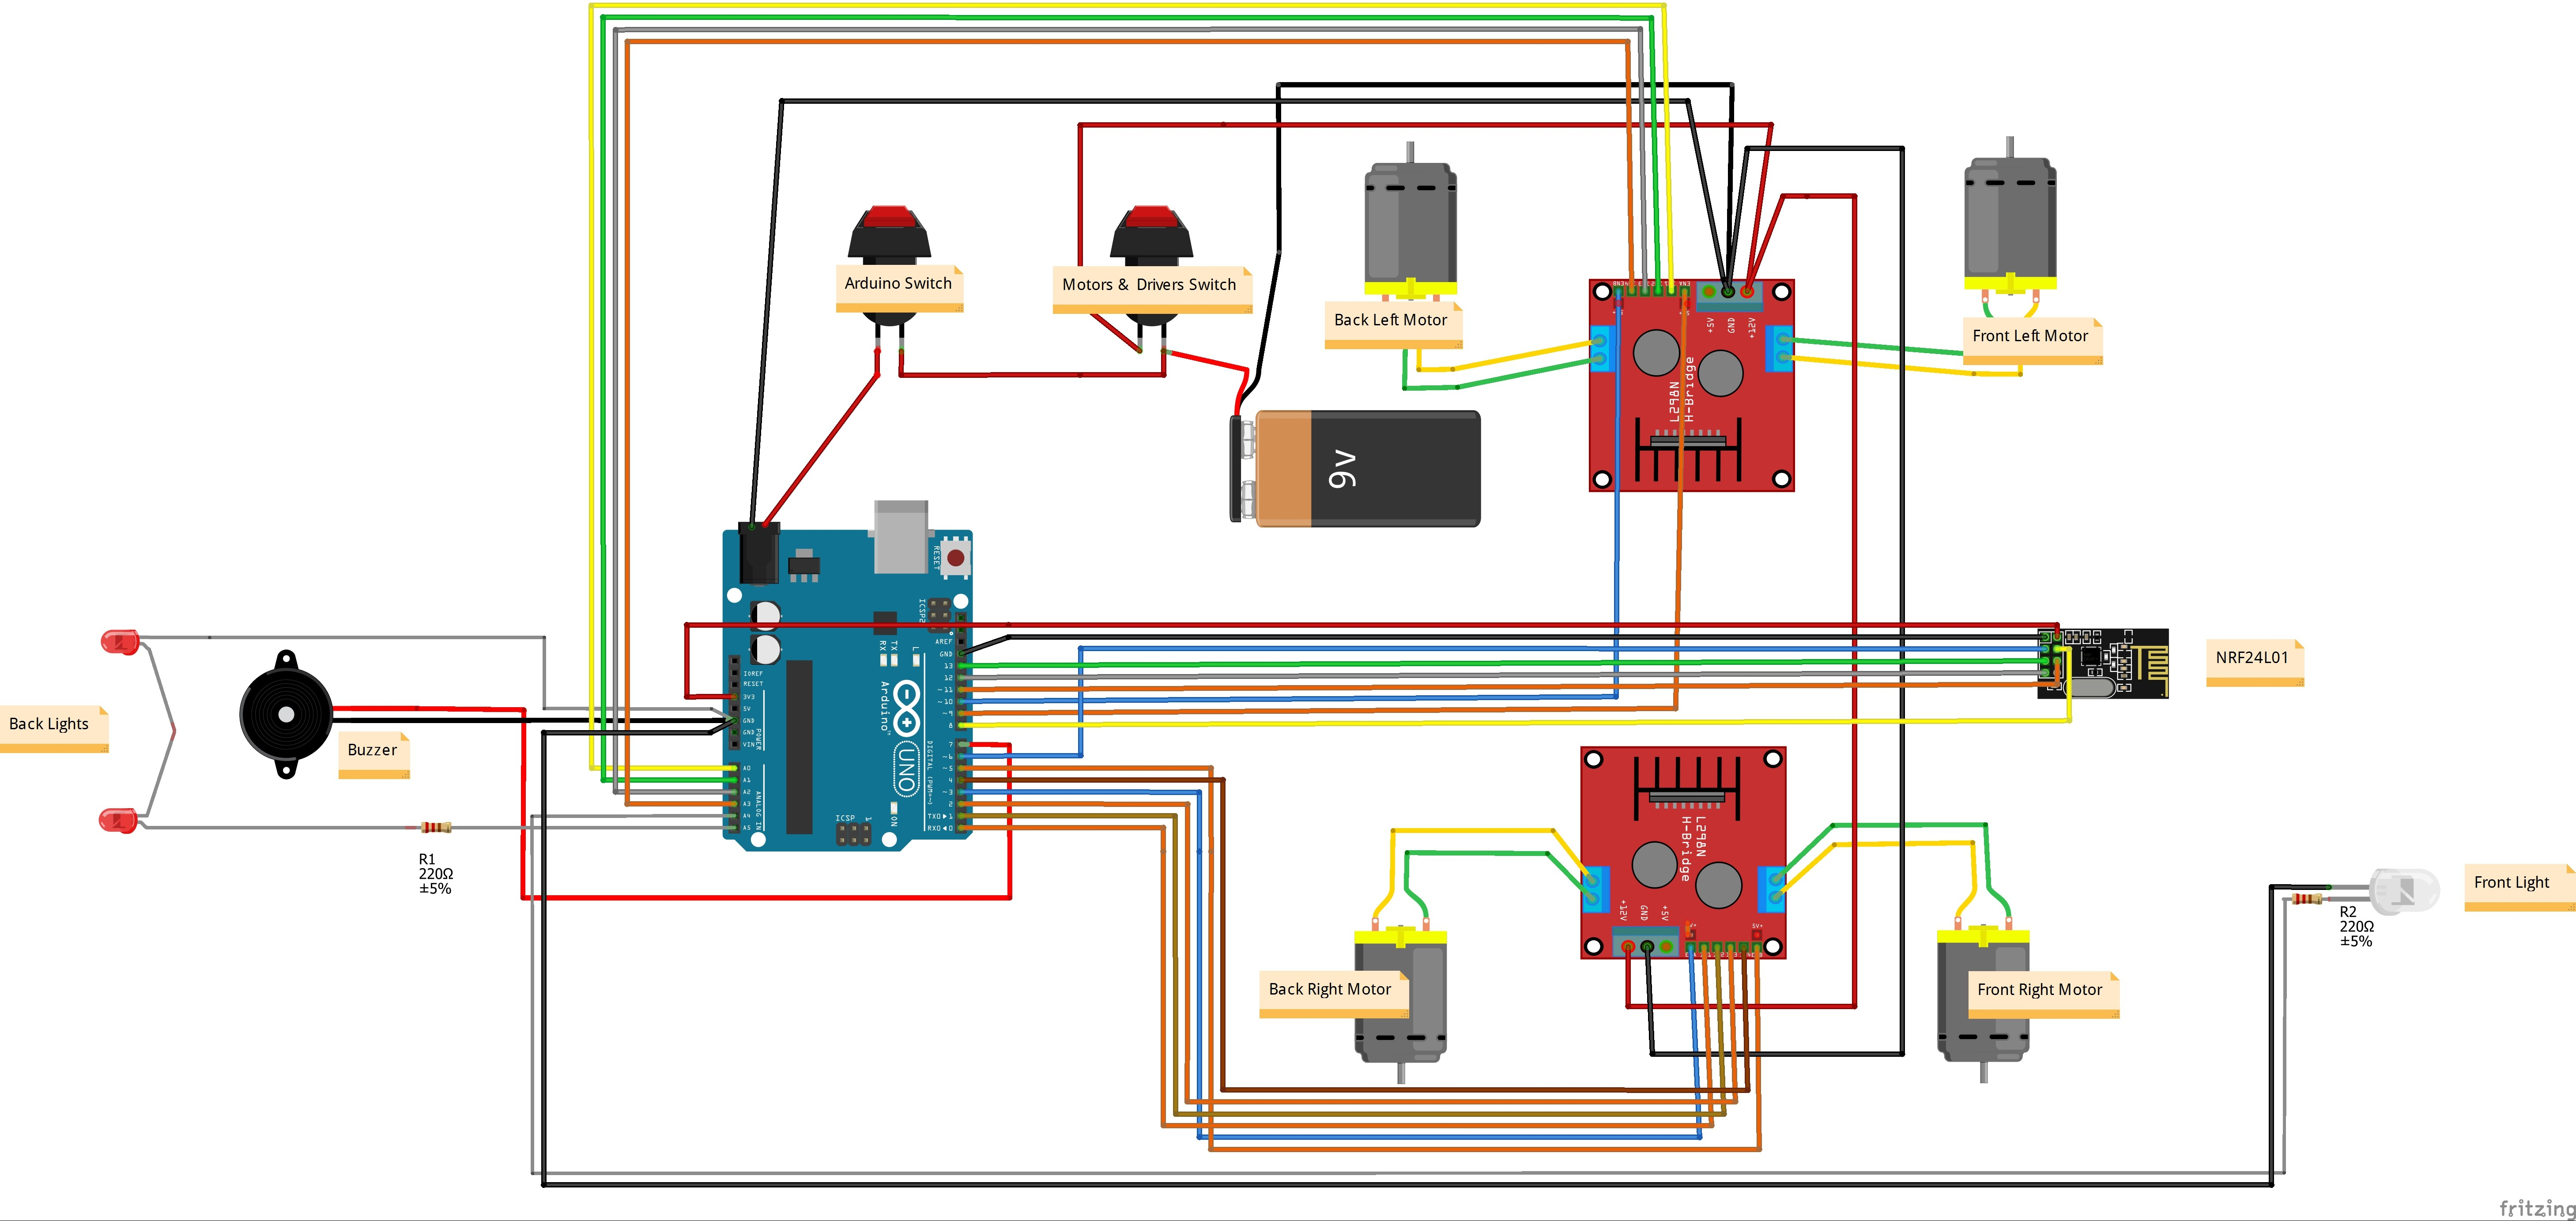 Wireless Remote Control Car Circuit Diagram Arduino 4wd Rc Car Hackster Of Wireless Remote Control Car Circuit Diagram